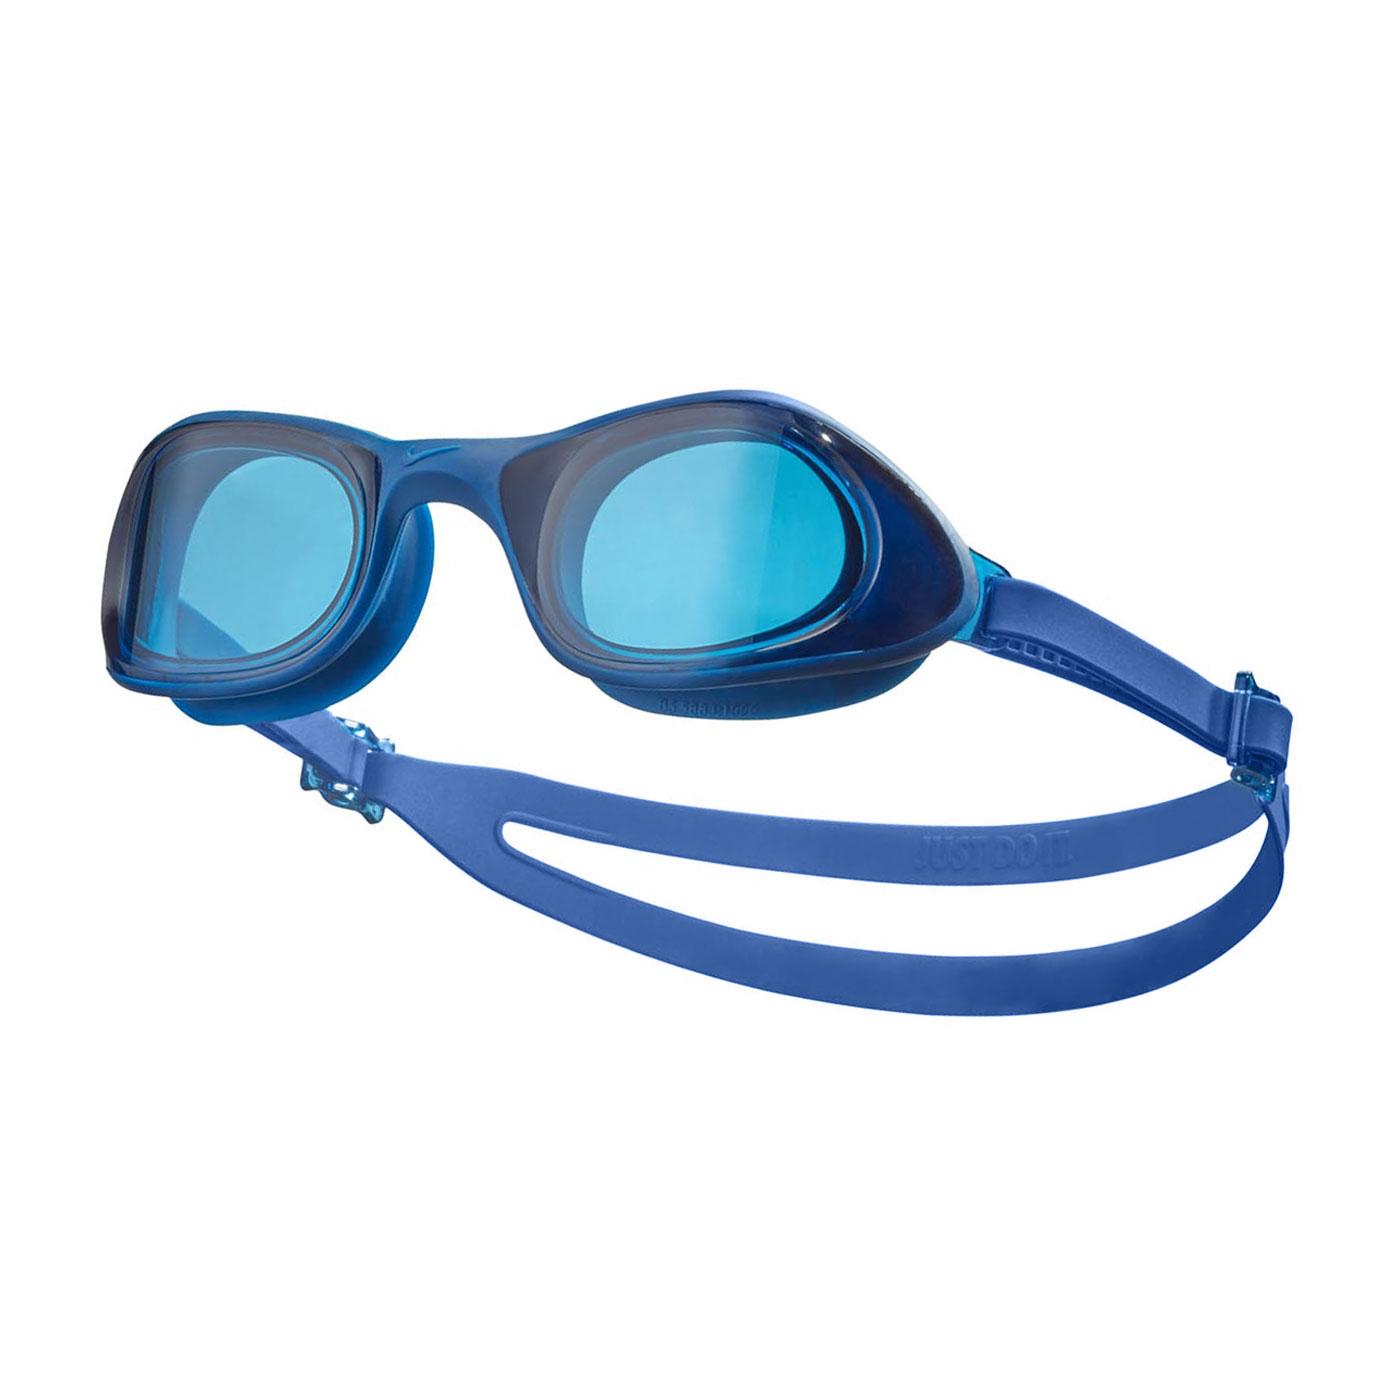 NIKE SWIM 成人超廣角泳鏡 NESSB161-400 - 藍